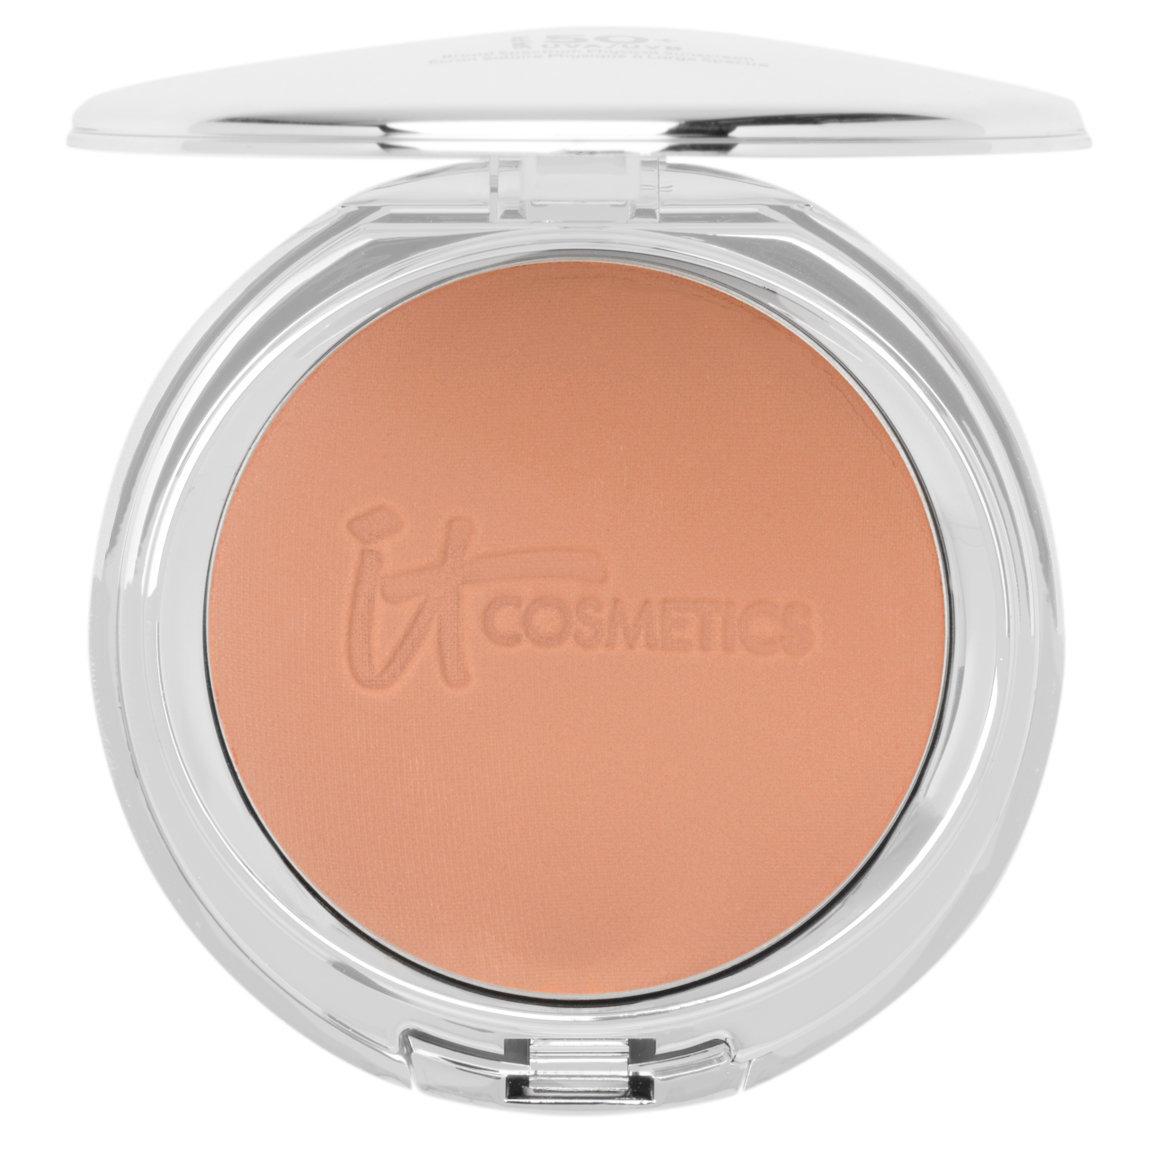 IT Cosmetics  Celebration Foundation SPF 50+ Deep alternative view 1 - product swatch.